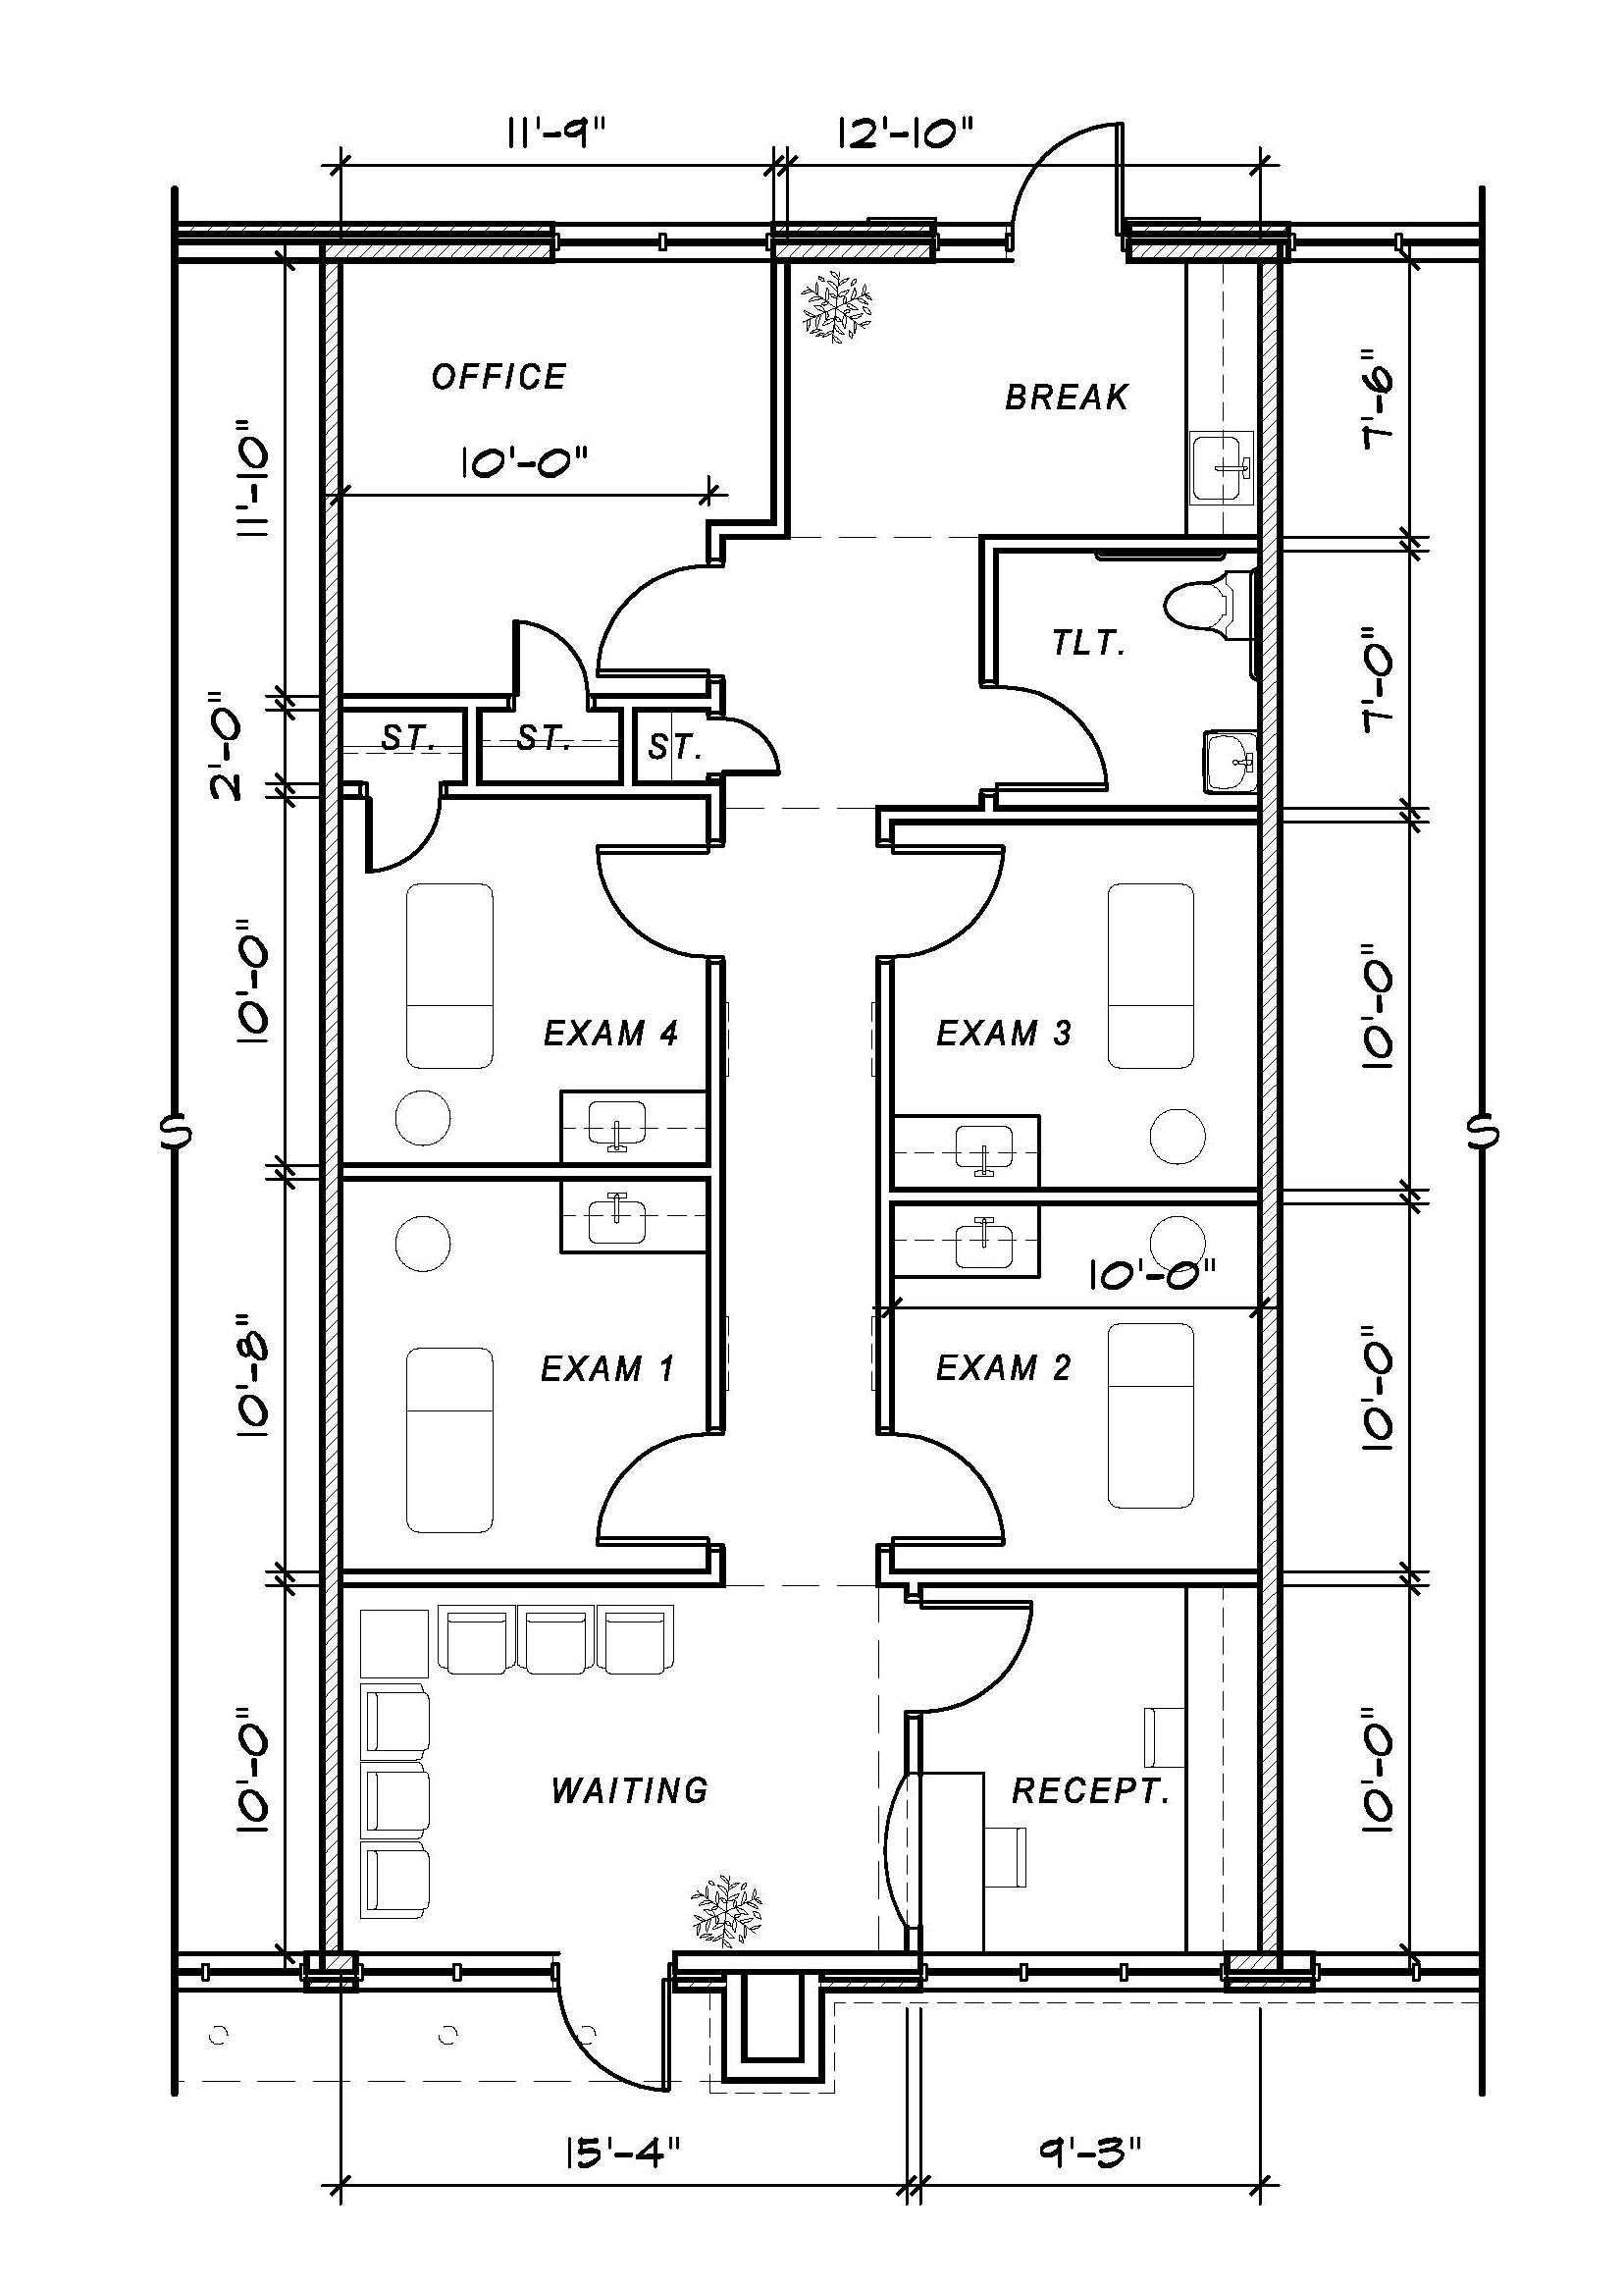 Medical Office Floor Plan Samples Decorating Inspiration Inspiration Ideas